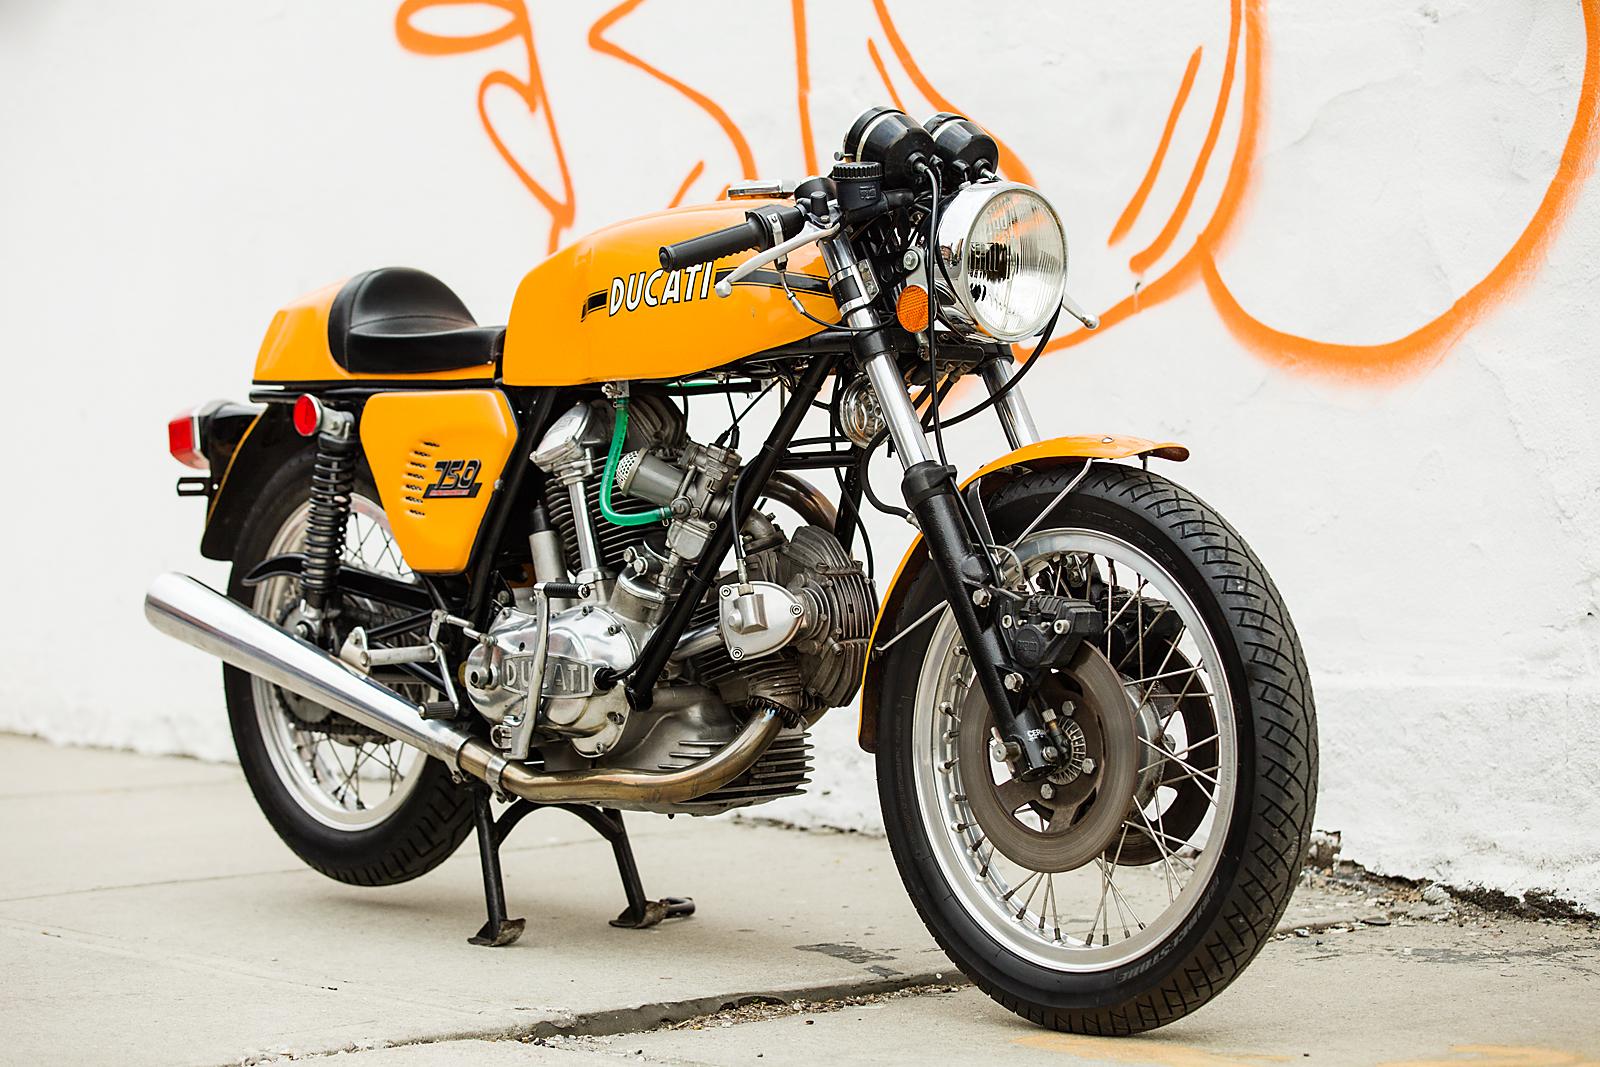 1974 Ducati 750S